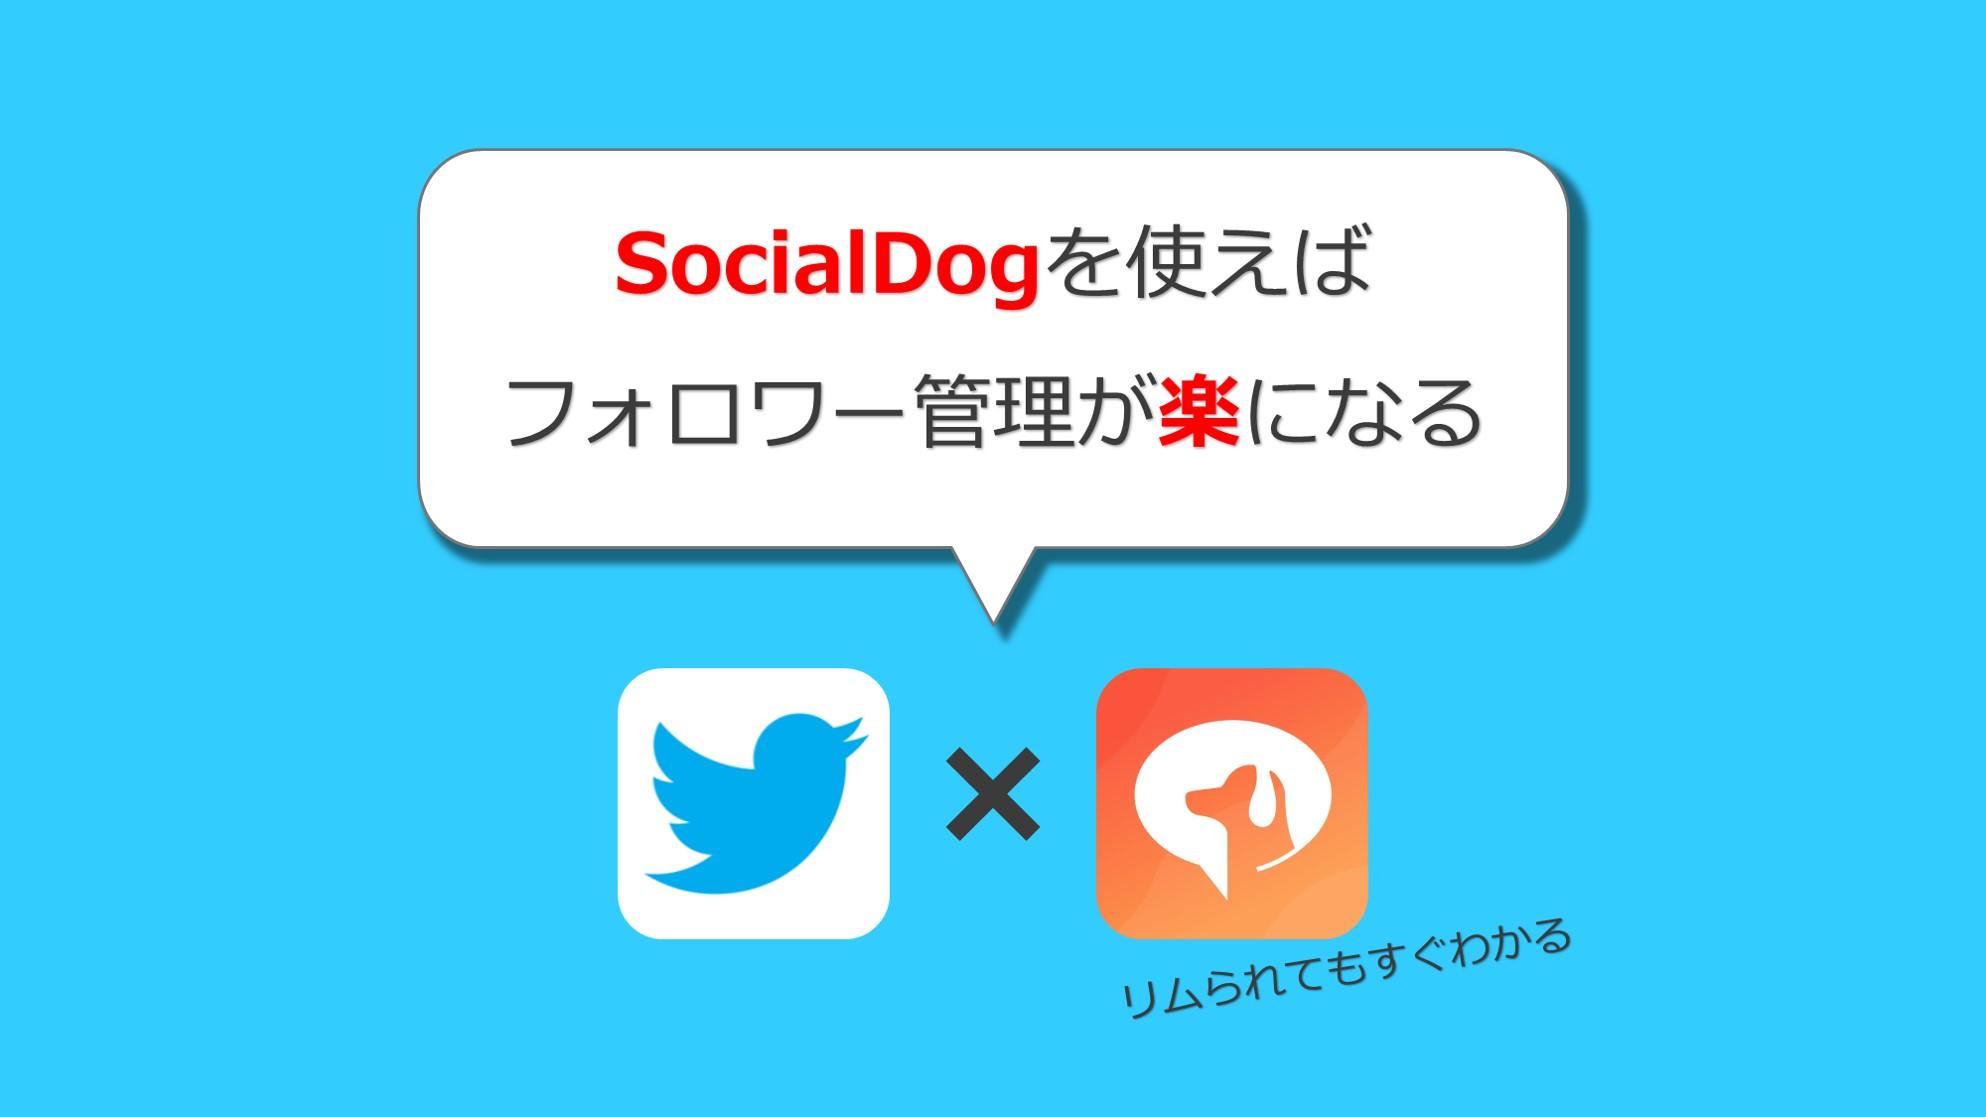 SocialDogならフォローされてない人やリムられた確認が楽